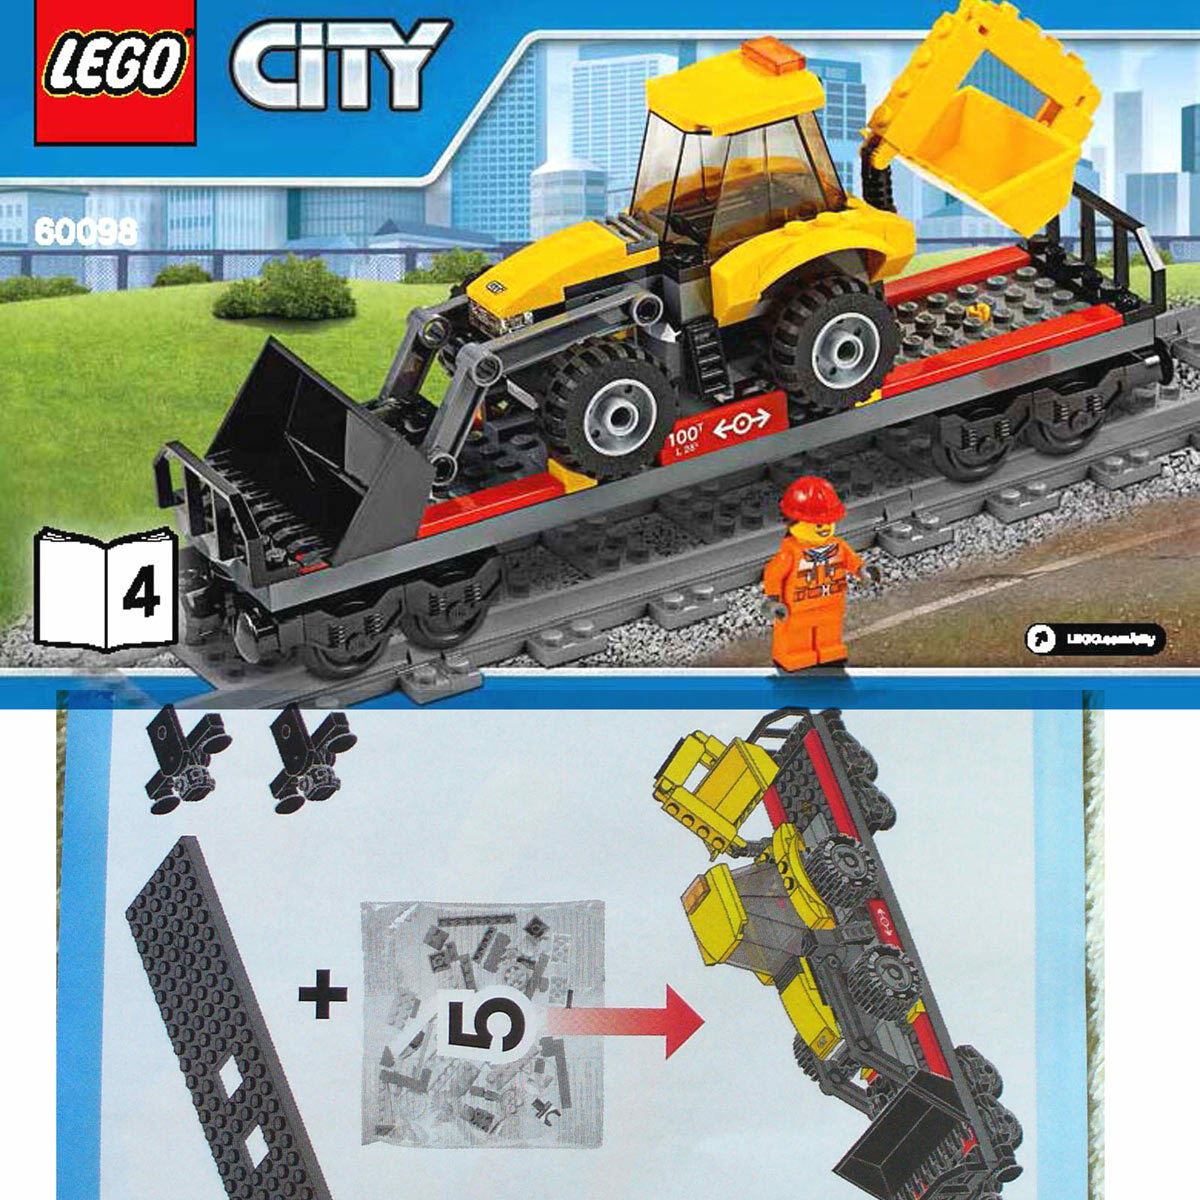 Lego Plana Coche Cargador Frontal Retroexcavadora W (Tren Lego pesado alcance libro 60098 - 4 B4)